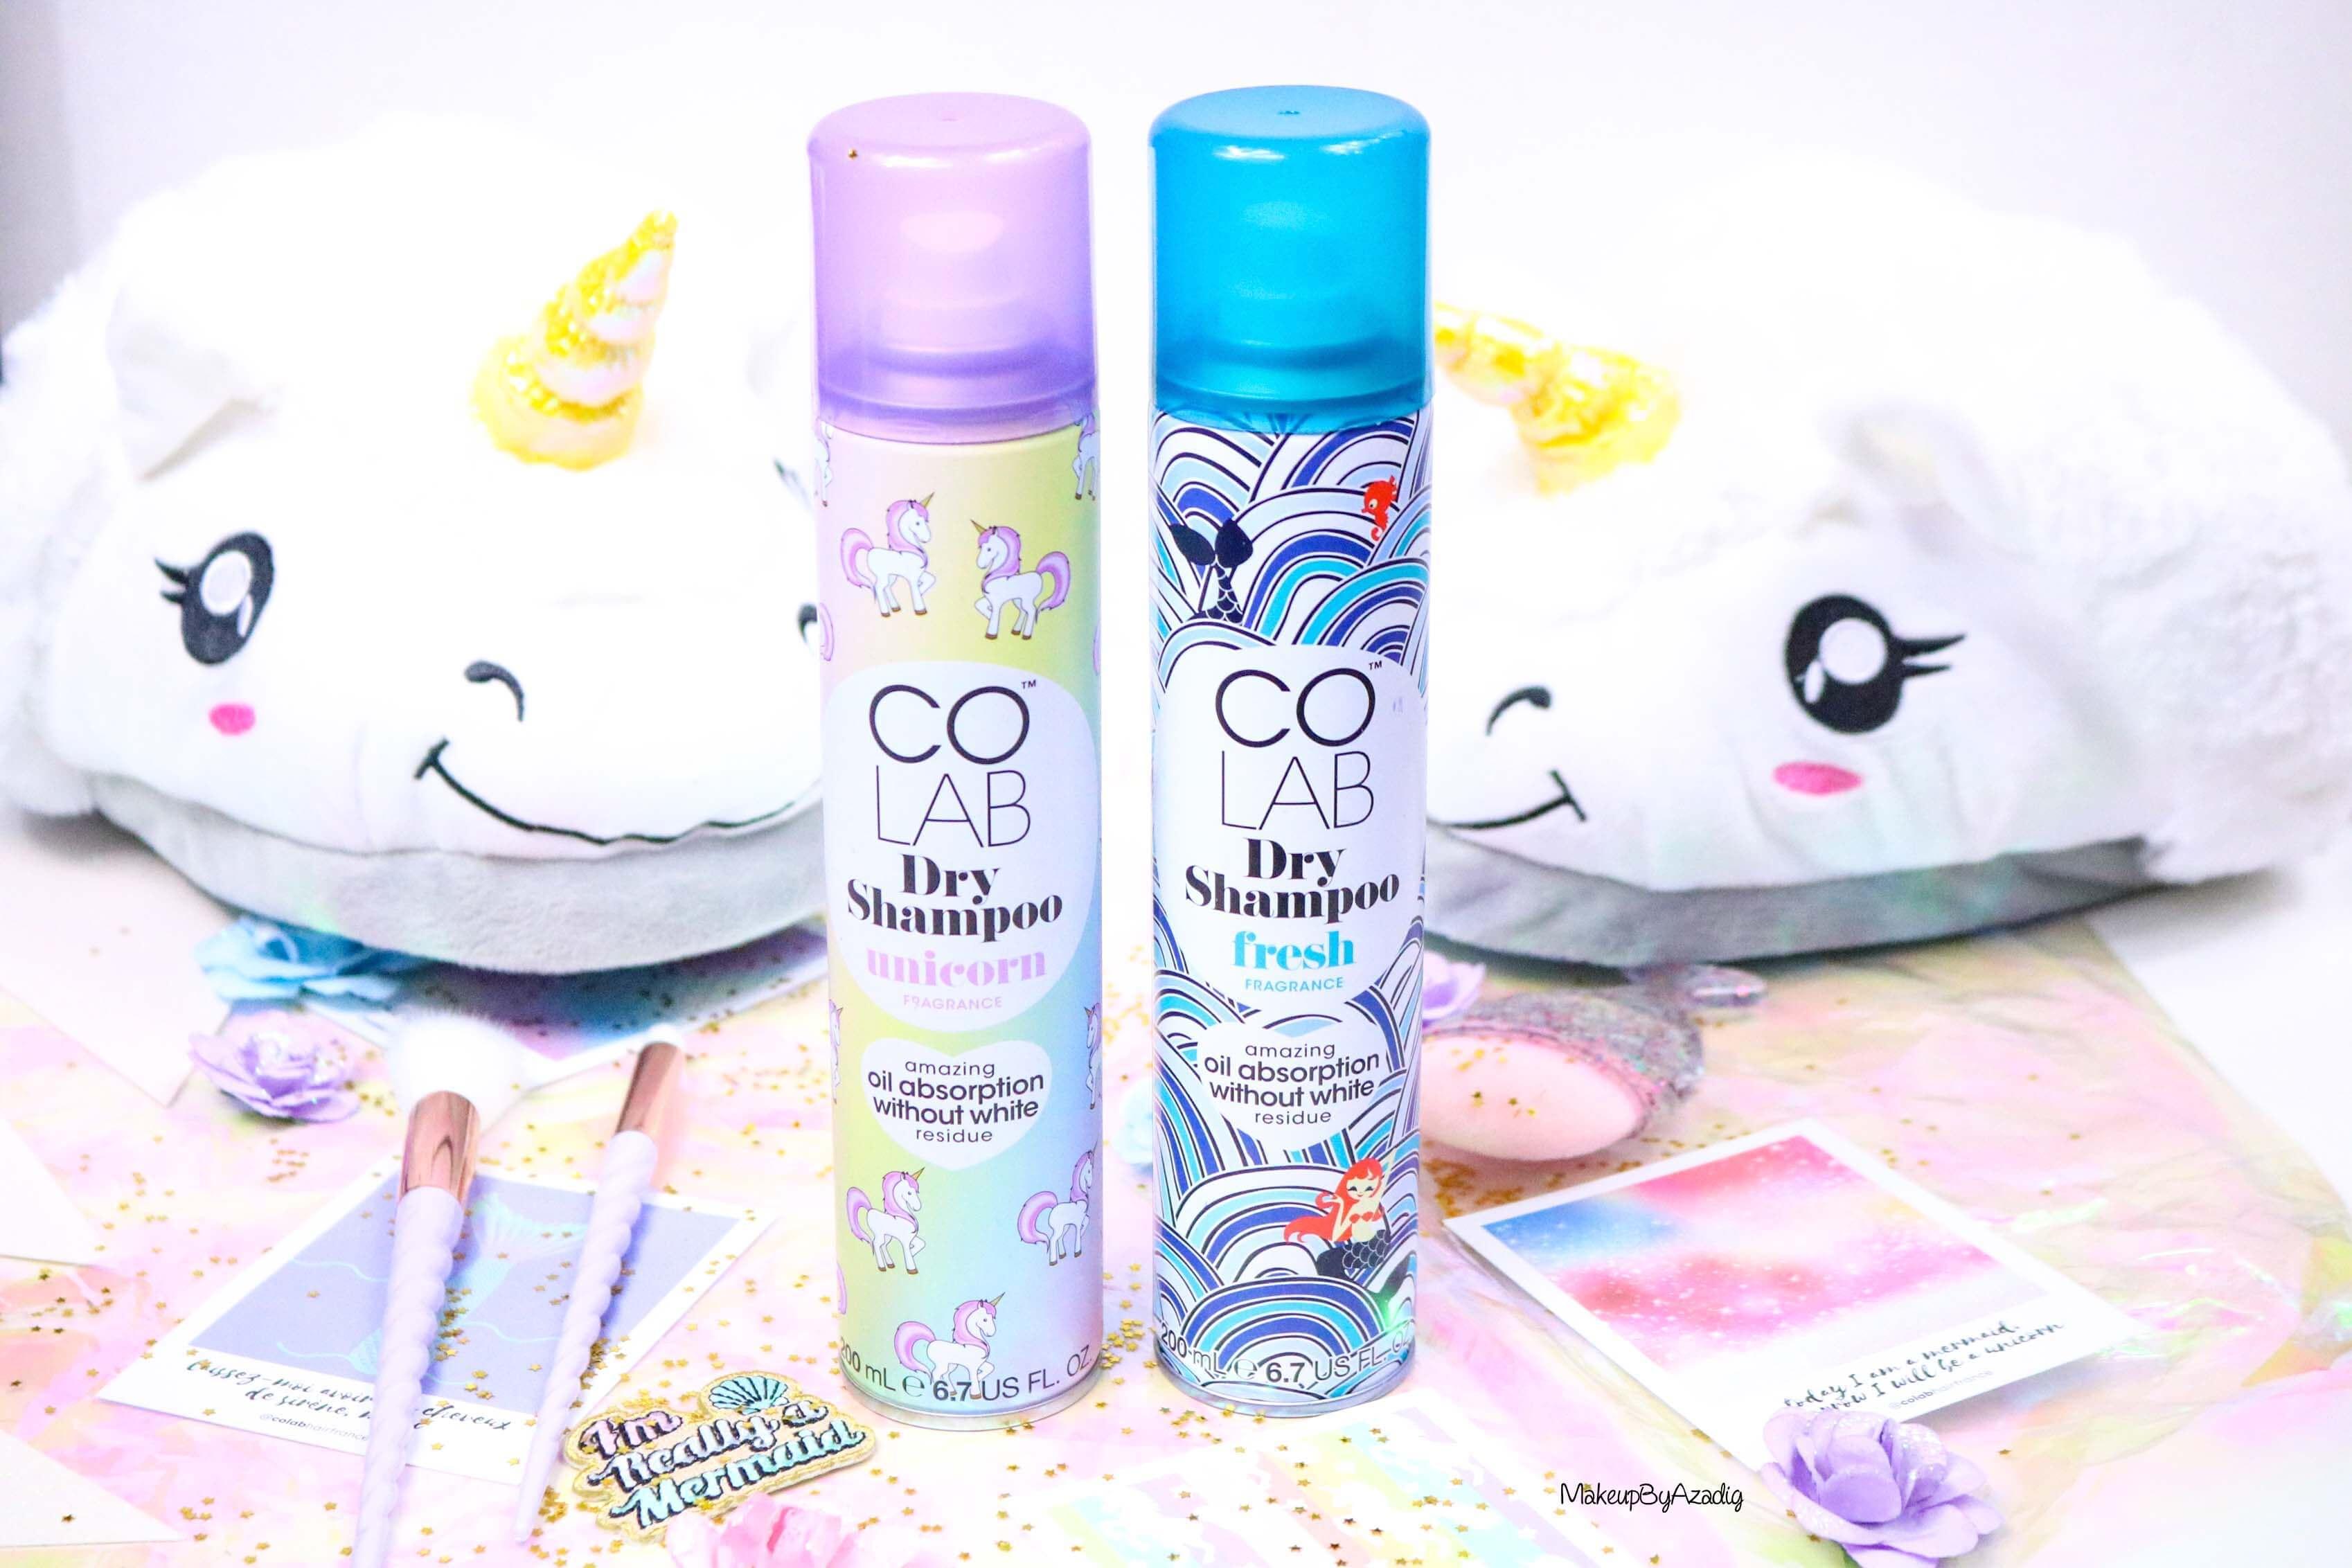 revue-shampooing-sec-colab-batiste-fresh-unicorn-monoprix-feelunique-prix-avis--soin-capillaire-efficacite-makeupbyazadig-duo